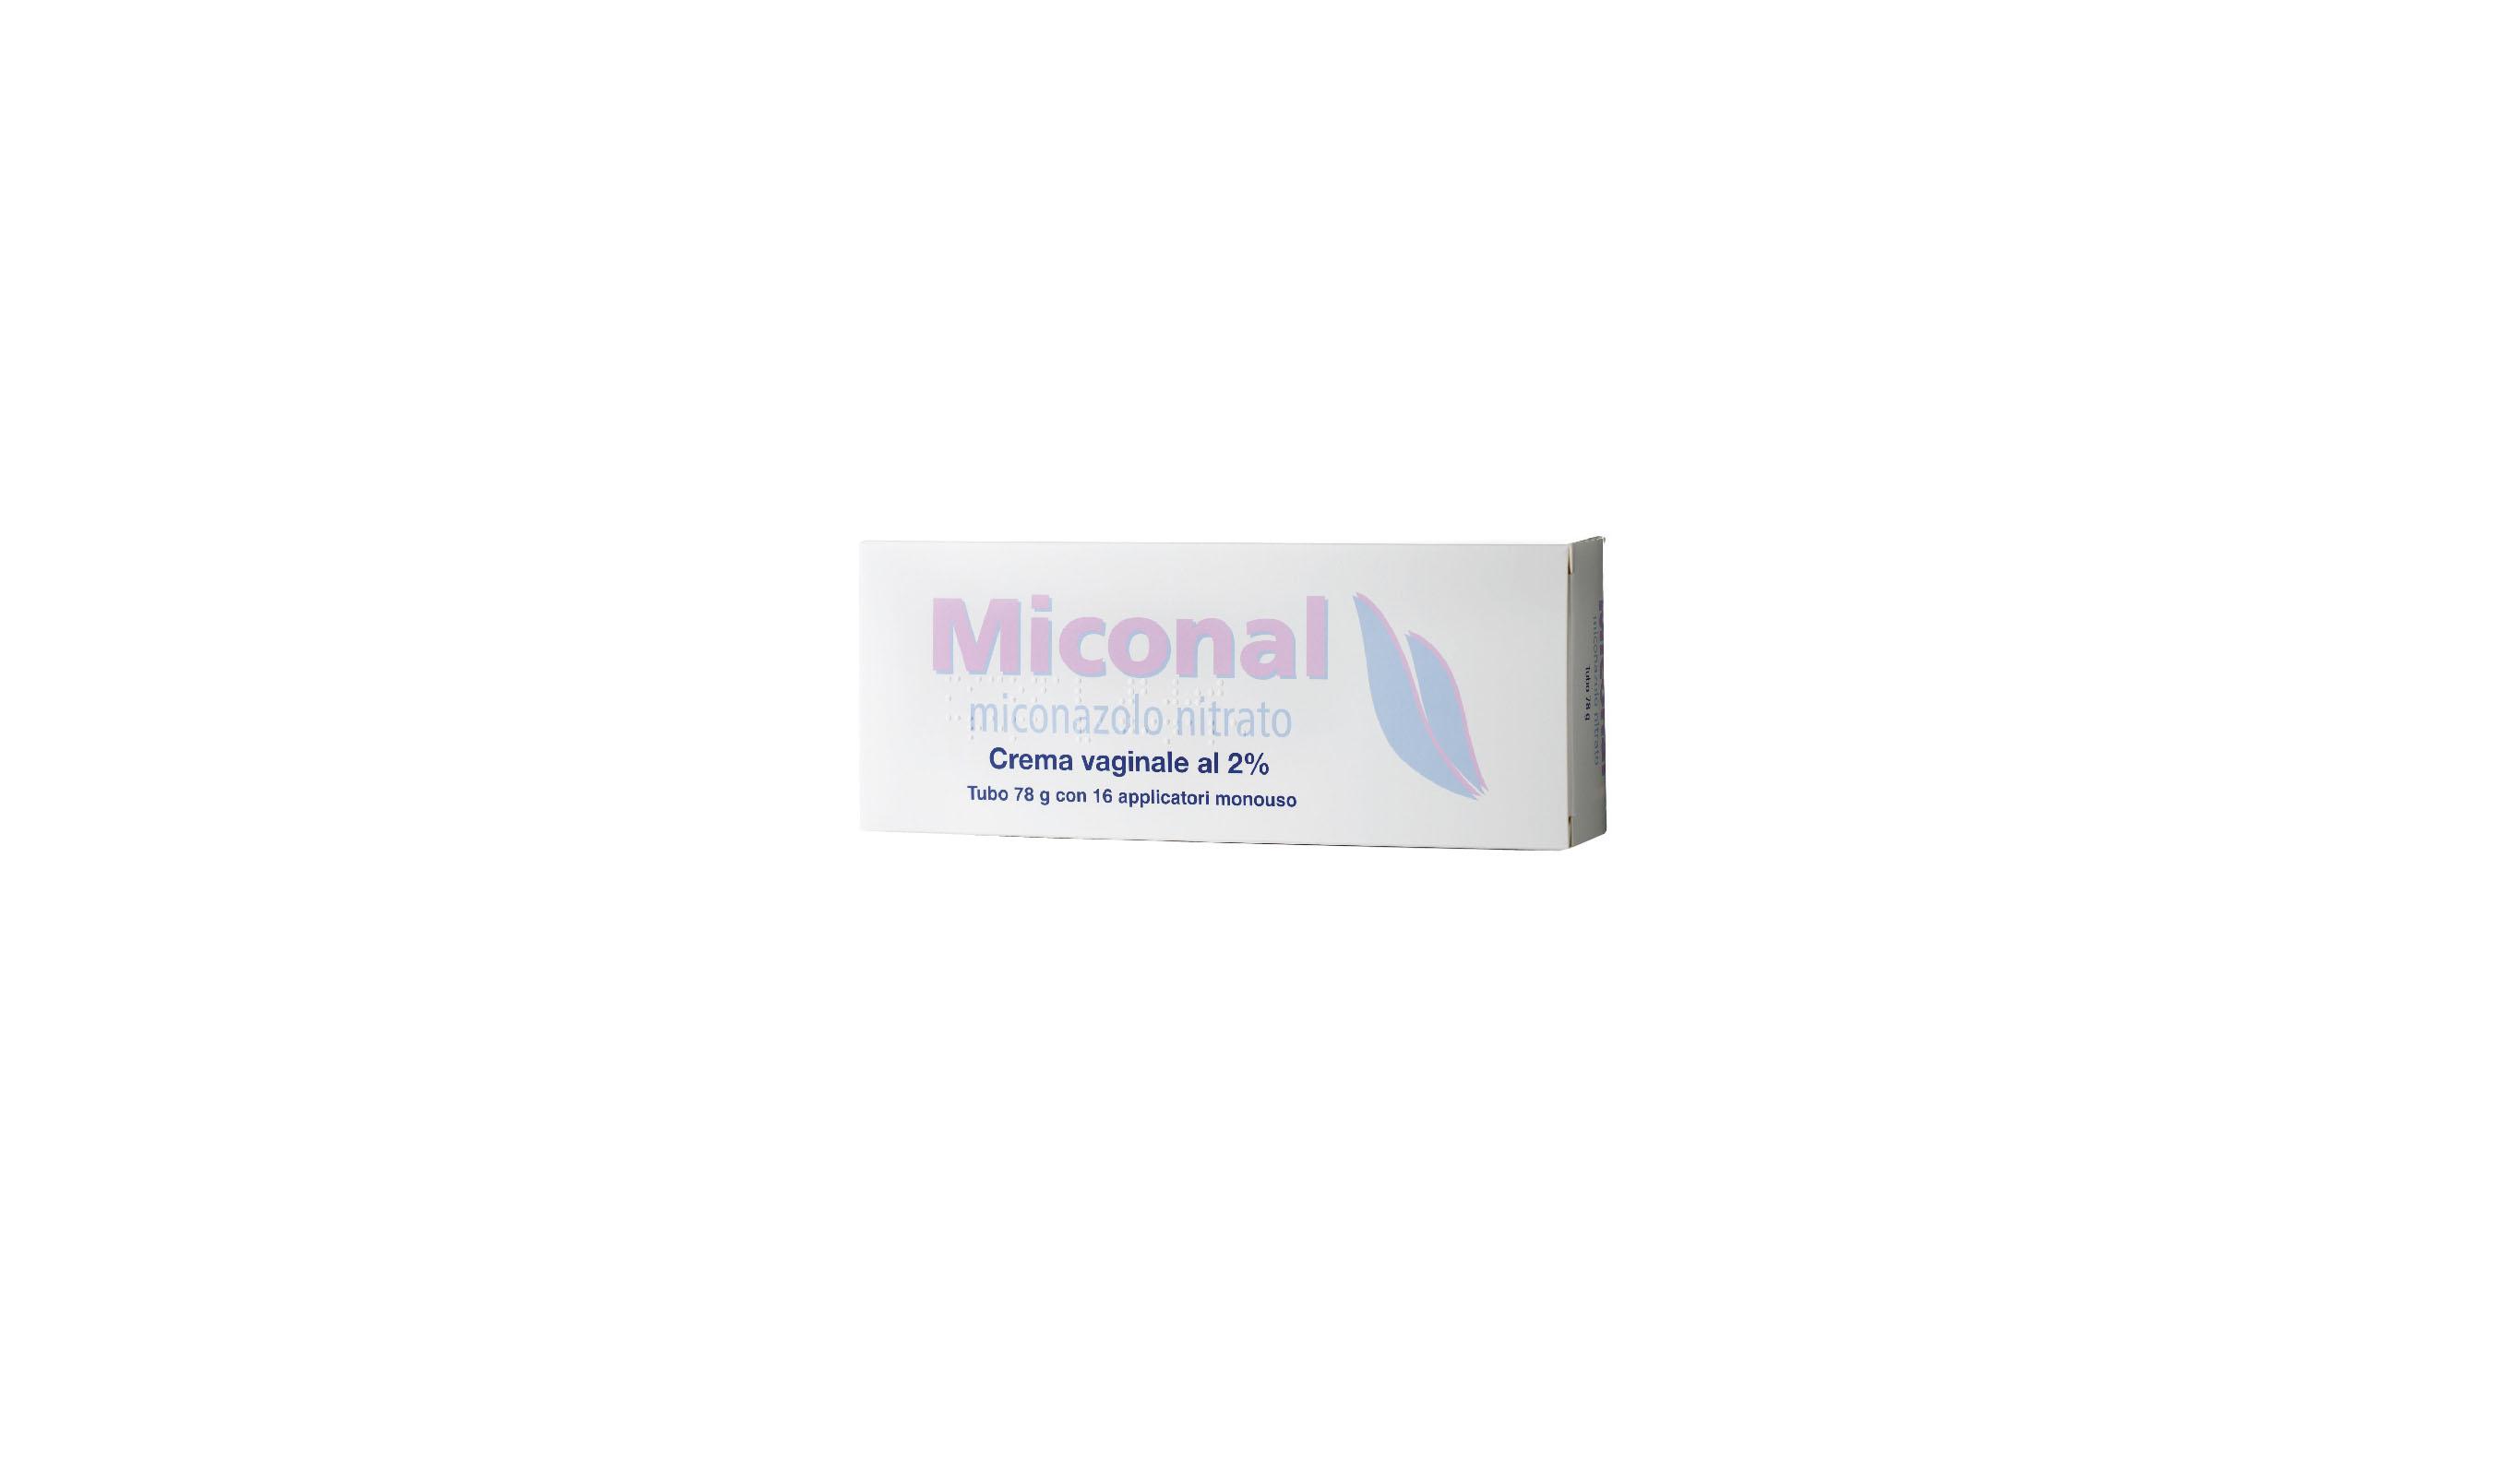 Miconal 2% Crema Vaginale Tubo 78 G